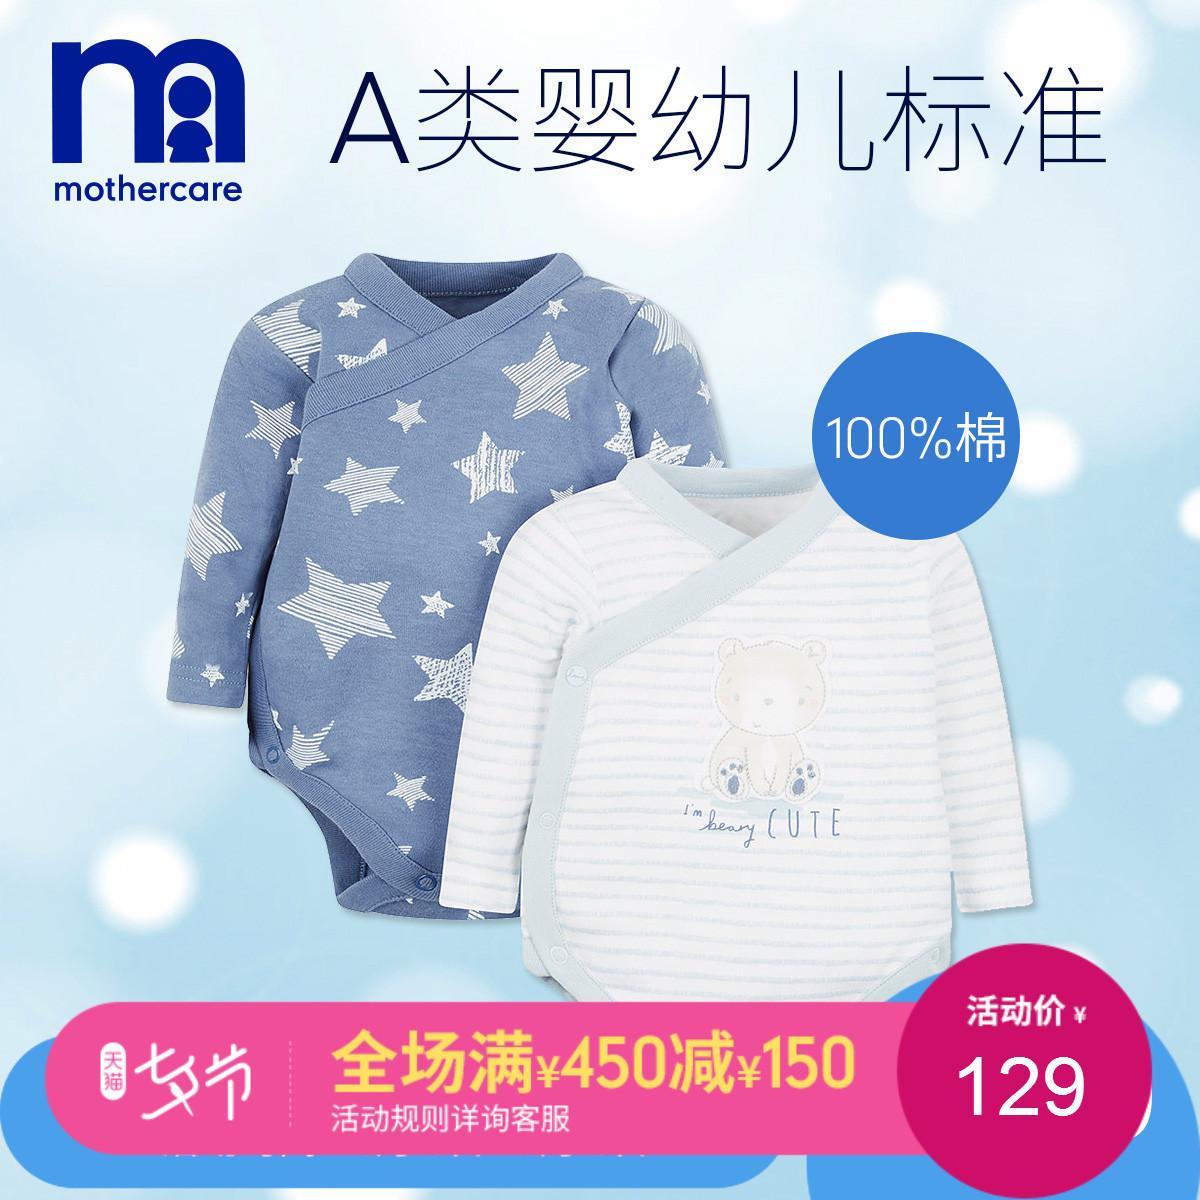 mothercare新生婴儿衣服新款夏男初生0-3个月宝宝连体衣棉斜开襟